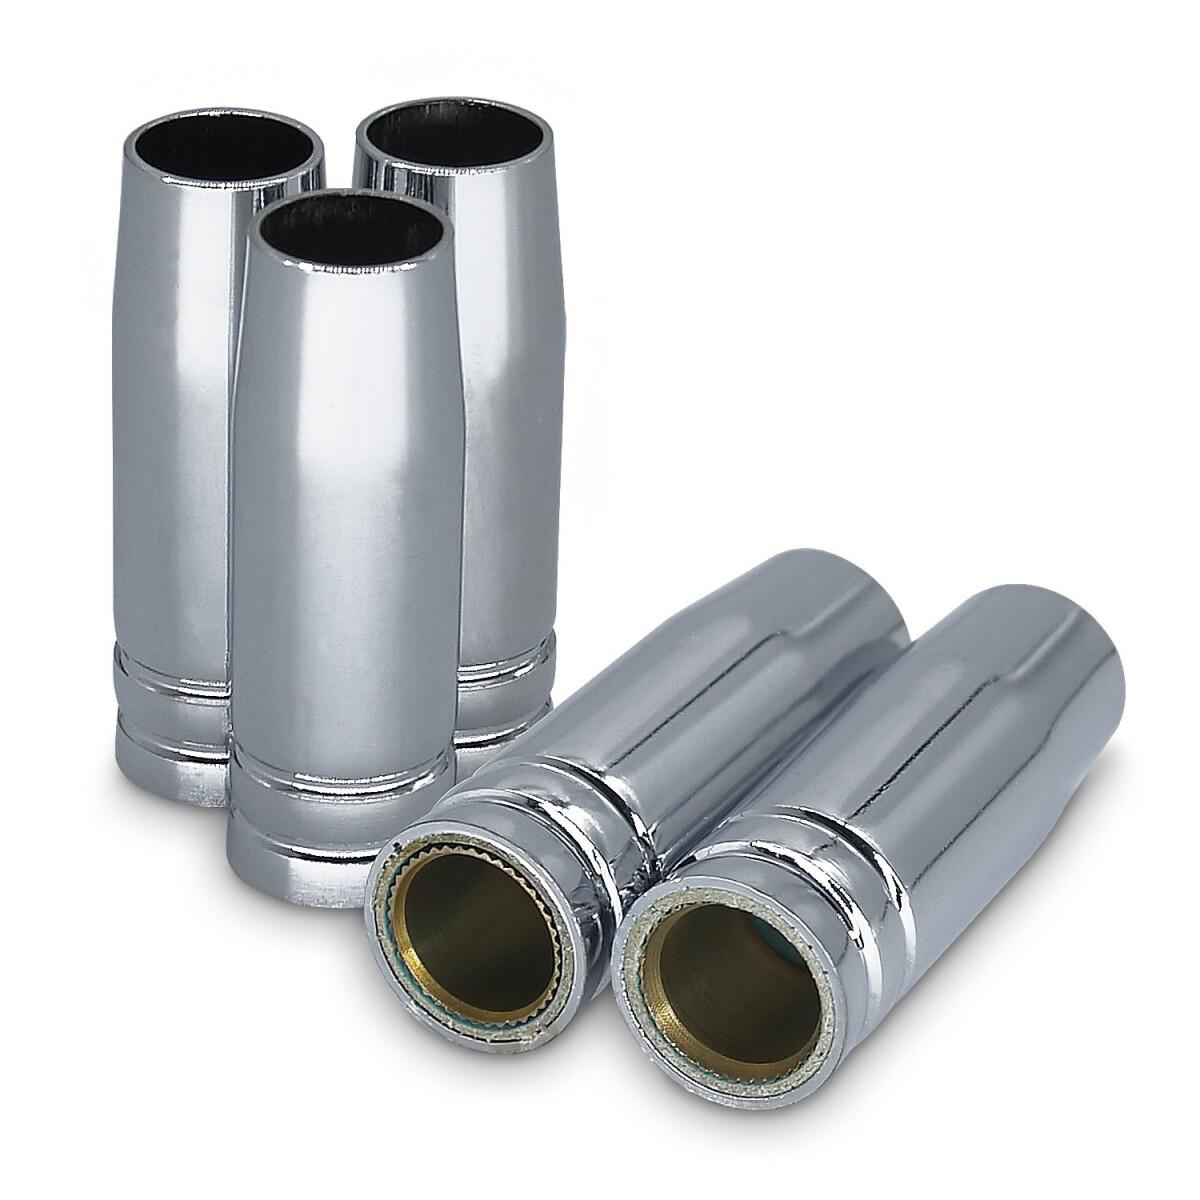 MIG MAG Gasschutz Schwei/ßdraht Stahl ER70S-6 Gr/ö/ße 0,8 5 kg